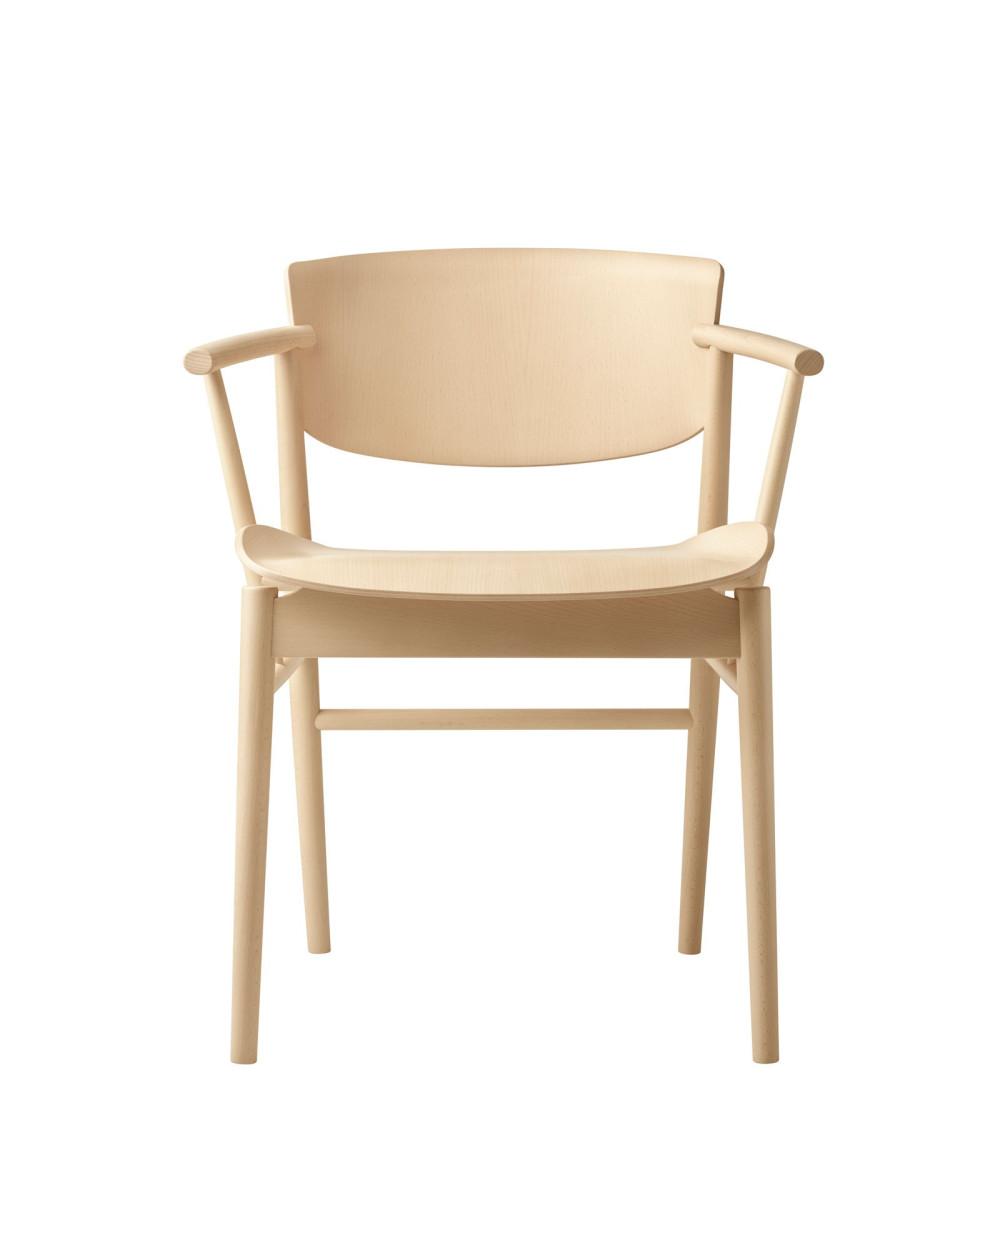 NO1 chair, Fritz Hansen